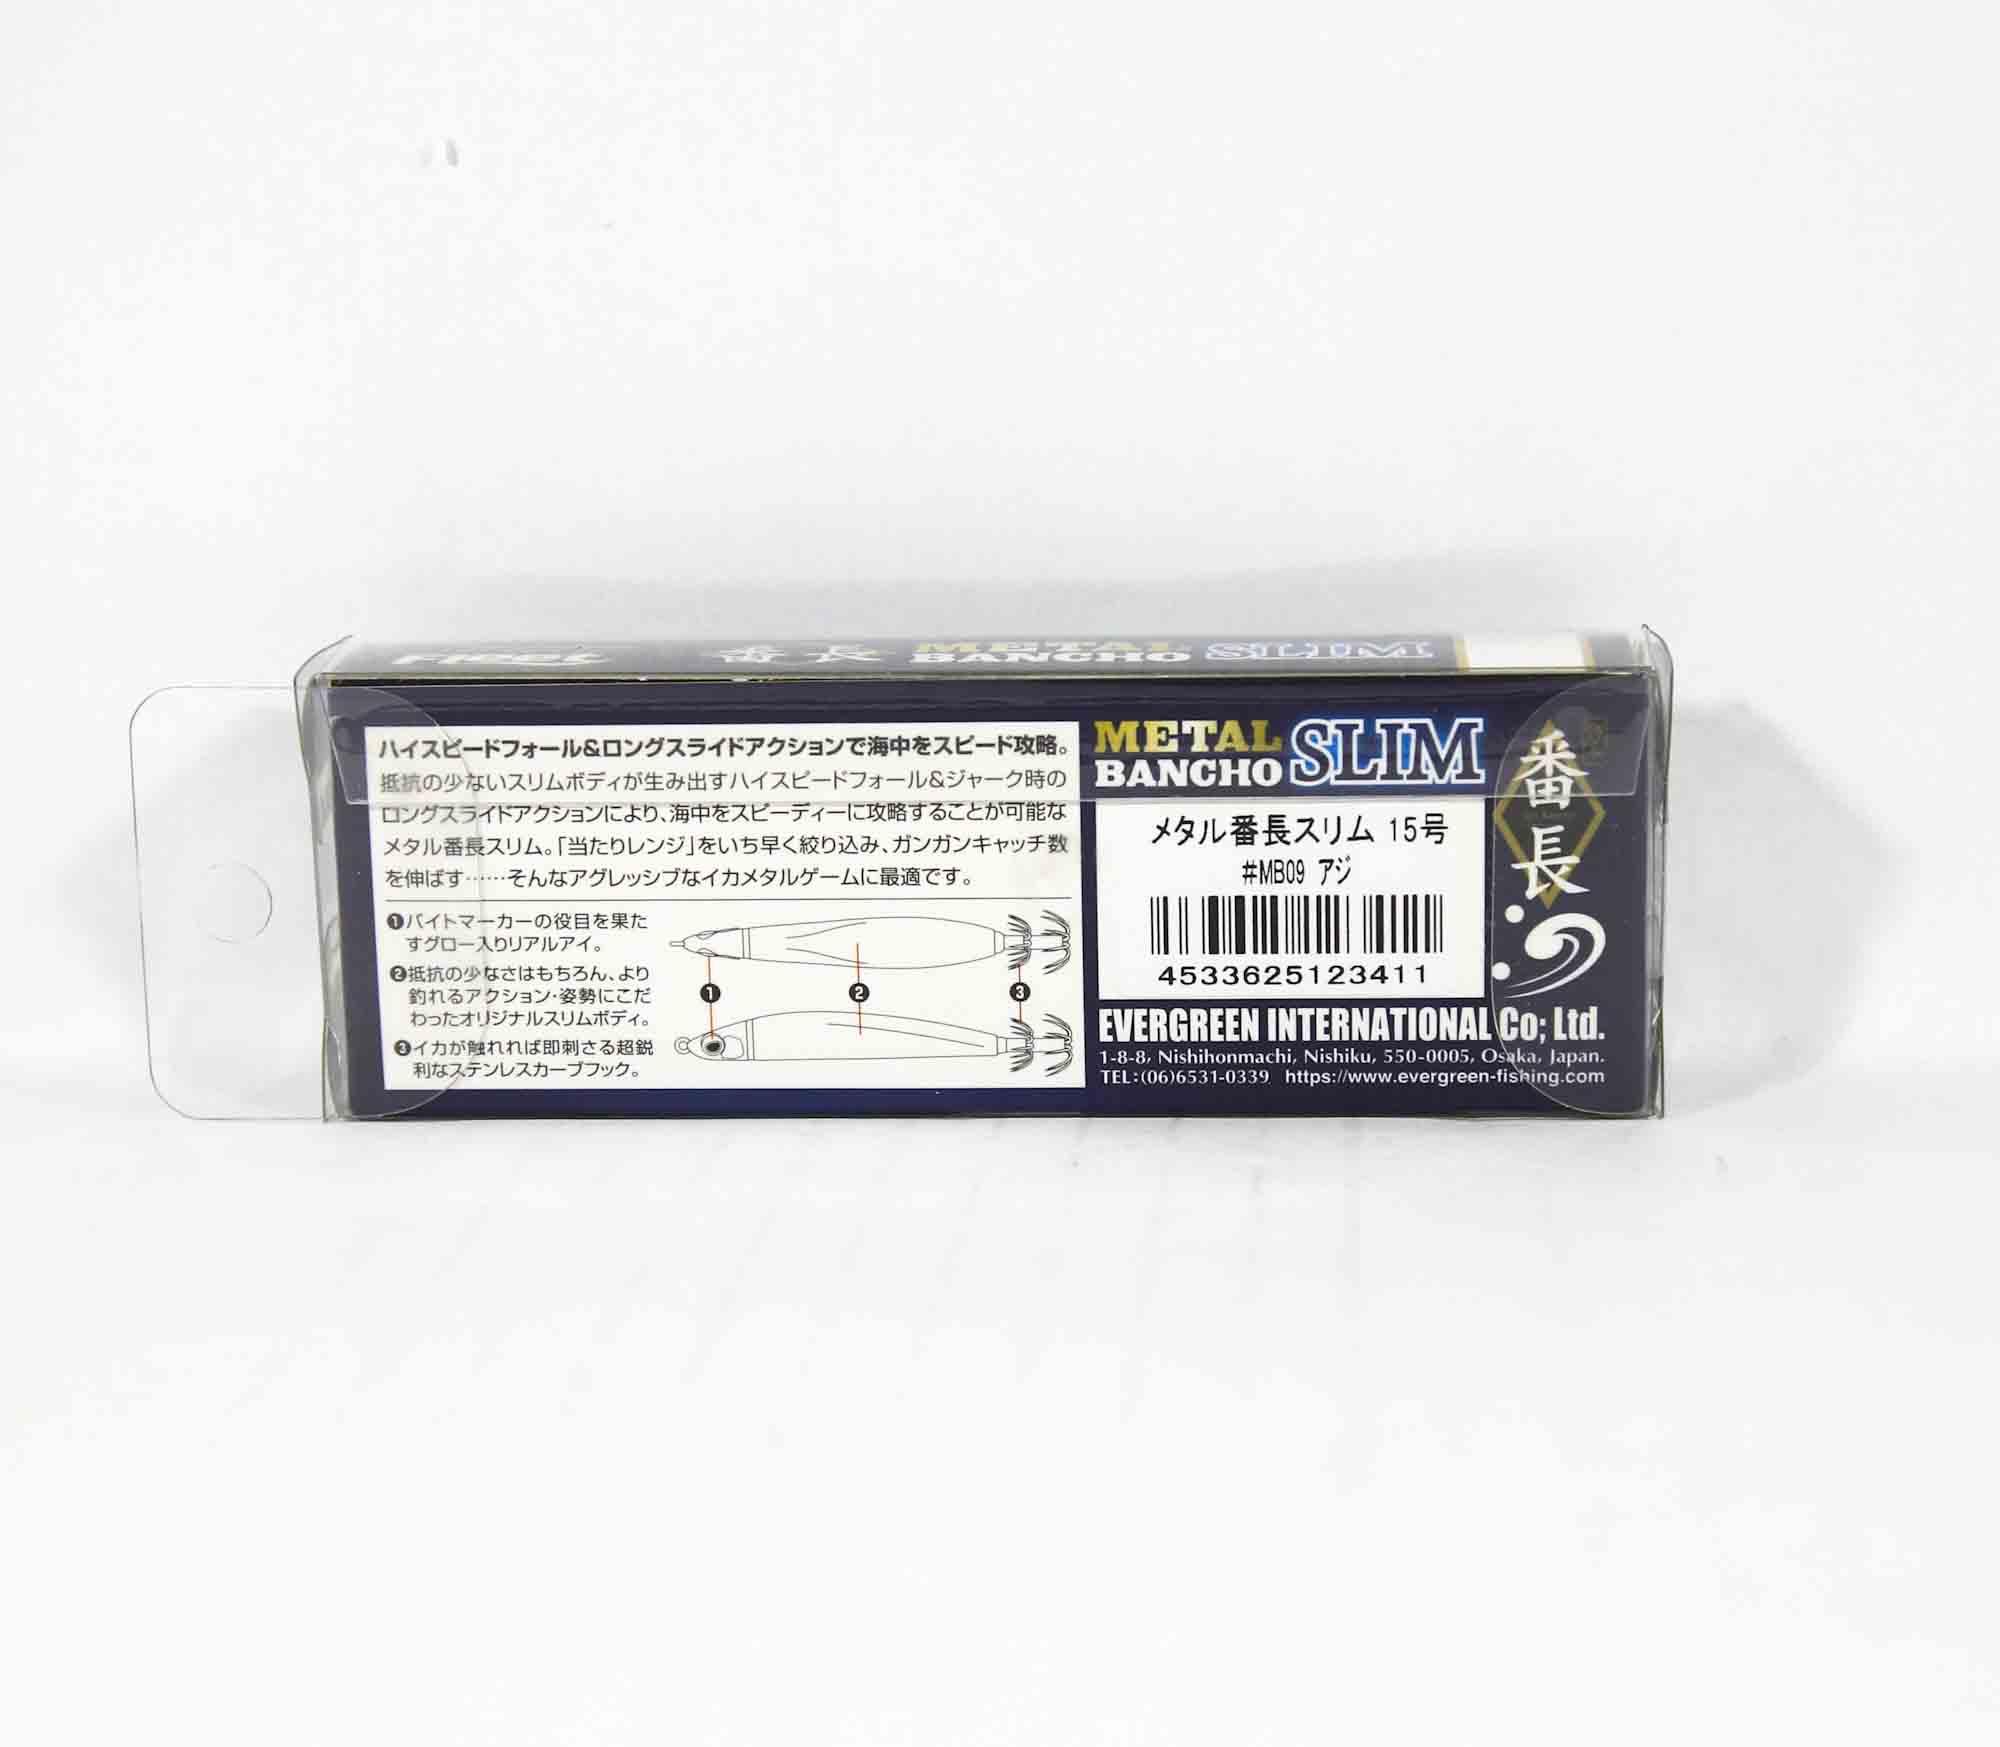 Evergreen Egi Metal Bancho Slim Squid Jig Size 20 75 grams MB10 3497